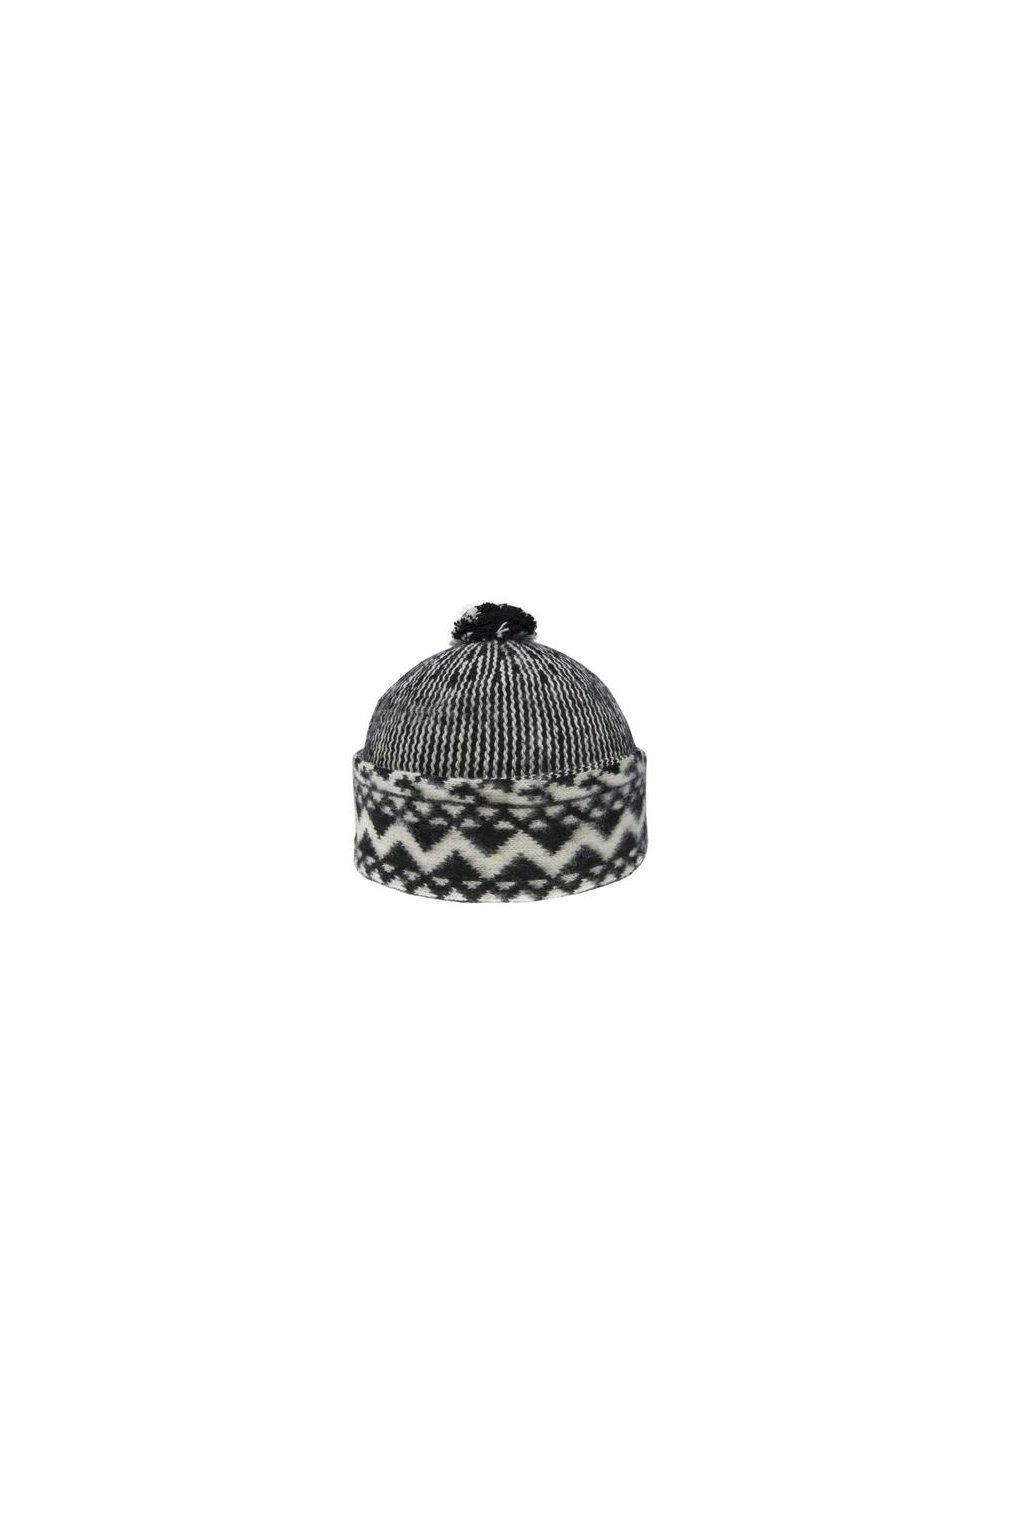 Triton 011 000014 cepice pletena vlnena zmijovka cerna (1)